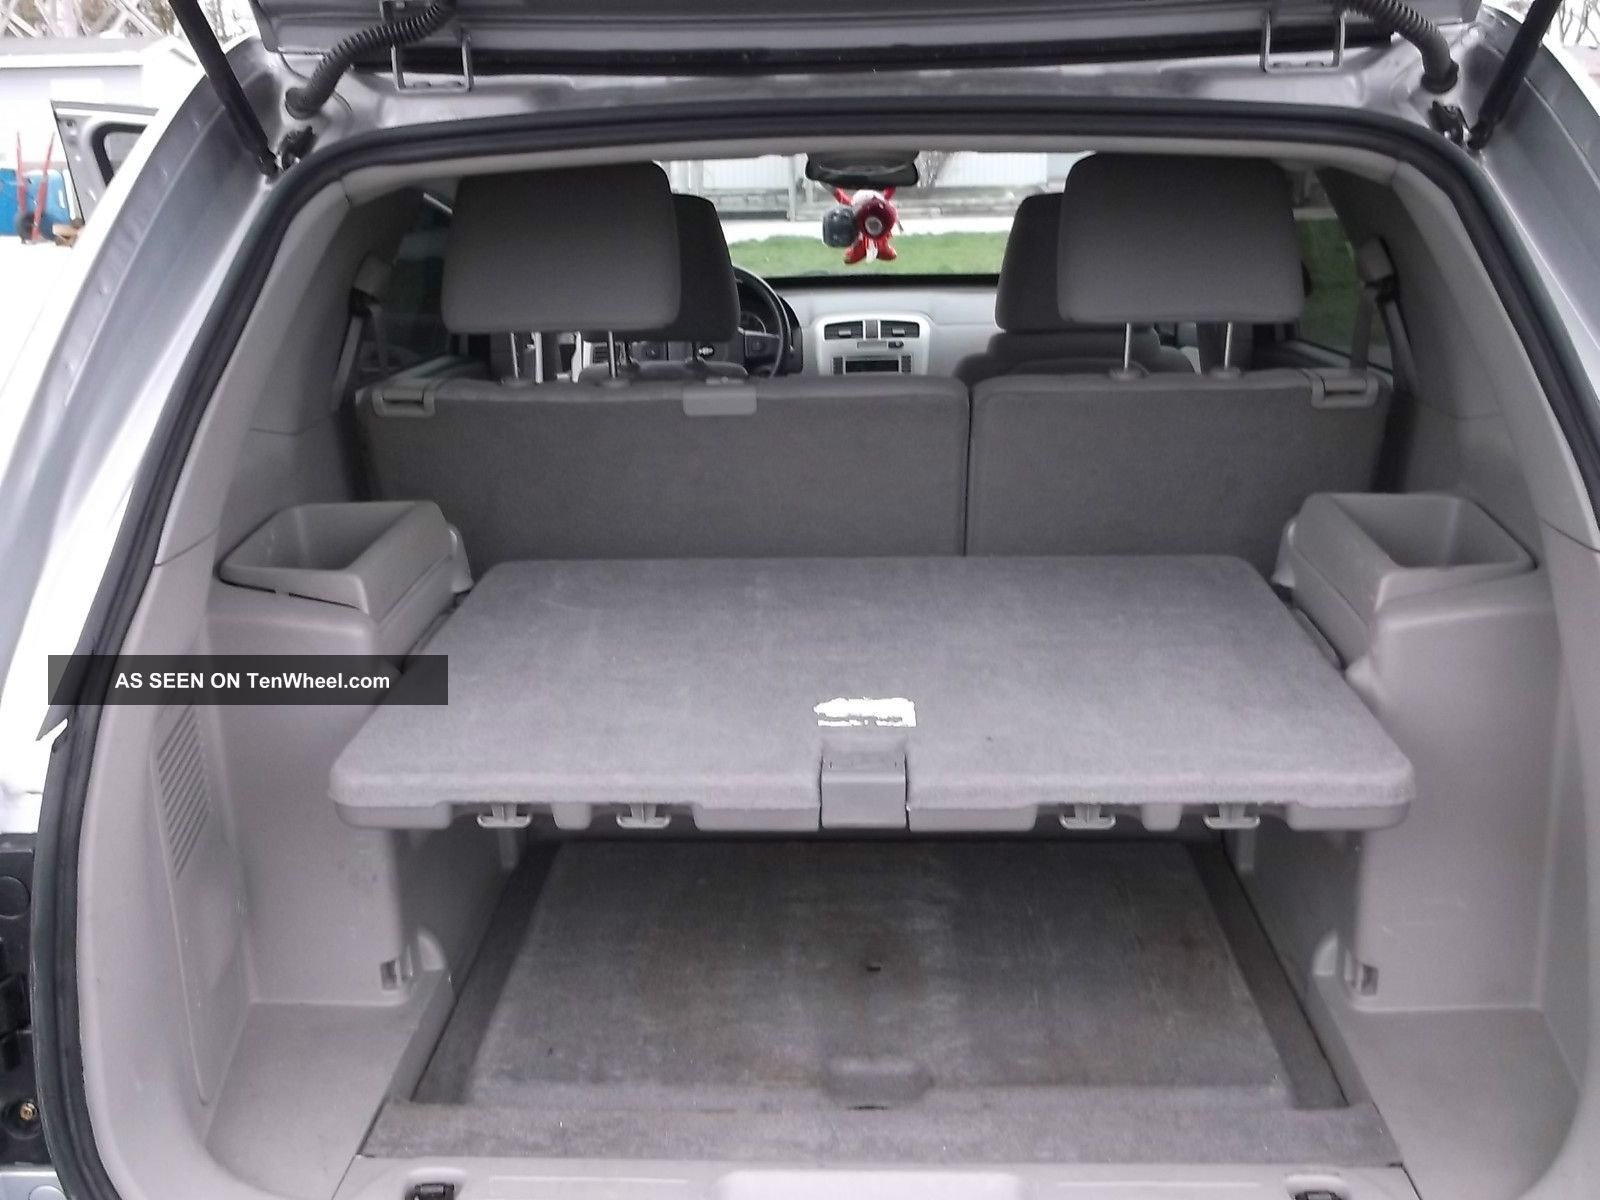 Chevrolet Equinox 2005 Interior   Image #228